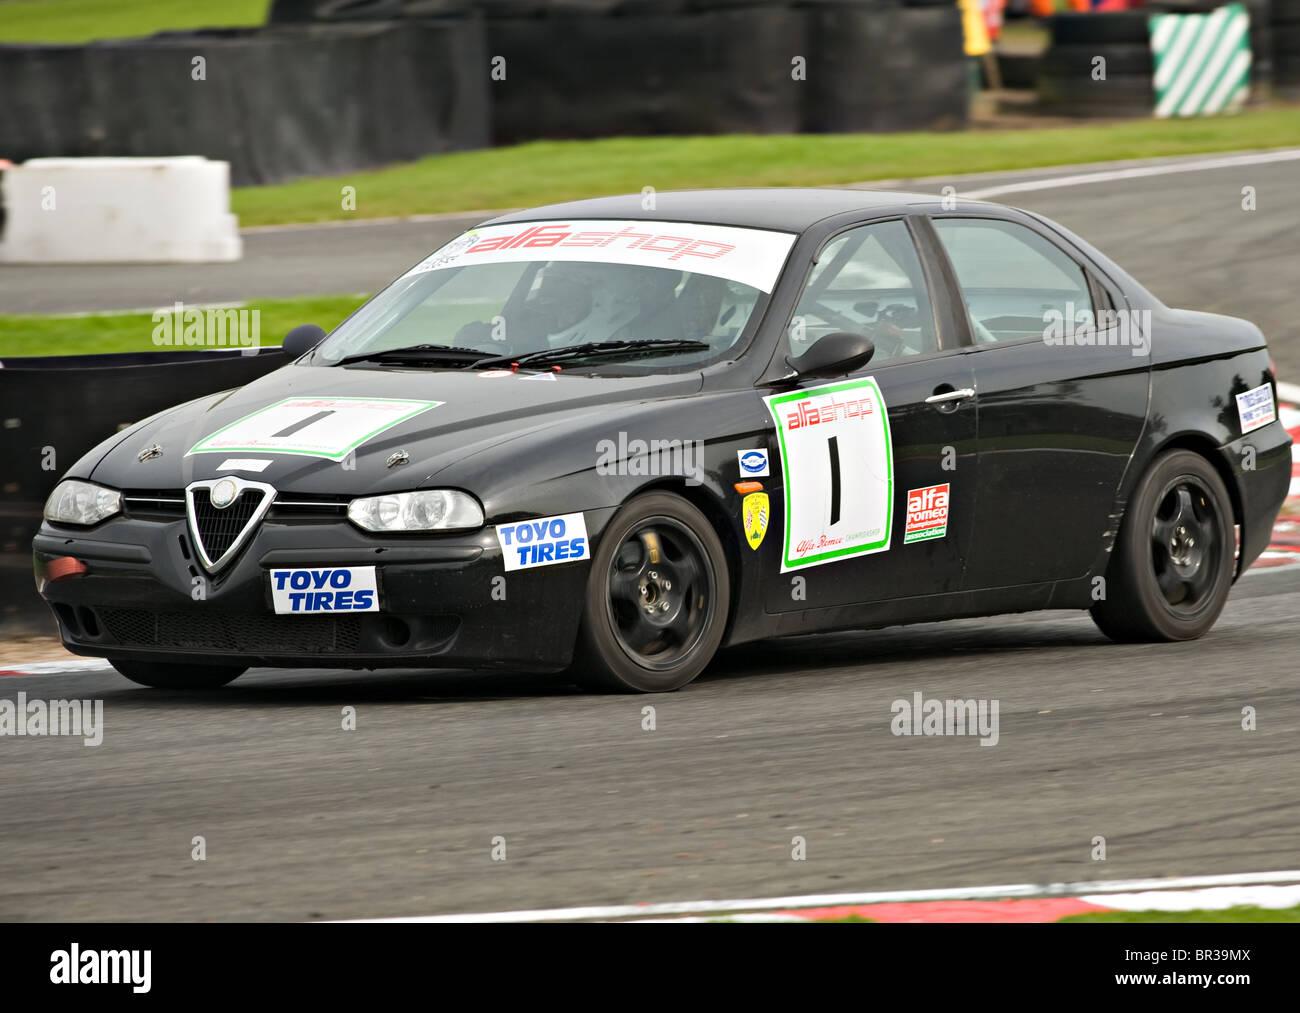 Alfashop Alfa Romeo 156 Saloon Race Car at Oulton Park Motor Racing Circuit Cheshire England United Kingdom UK Stock Photo